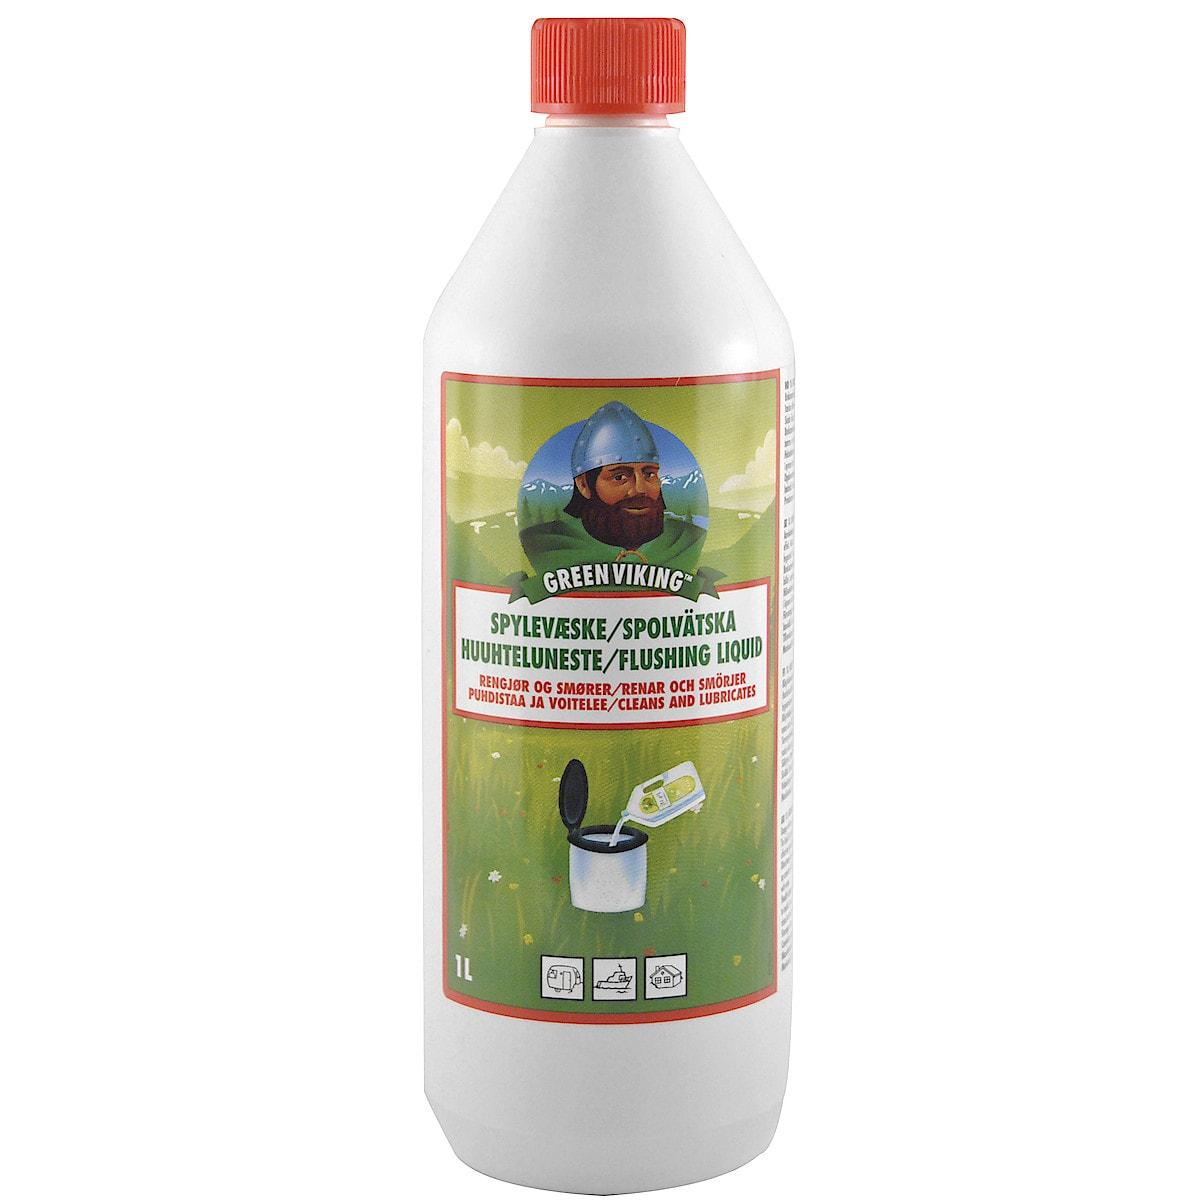 Green Viking sanitærvæske